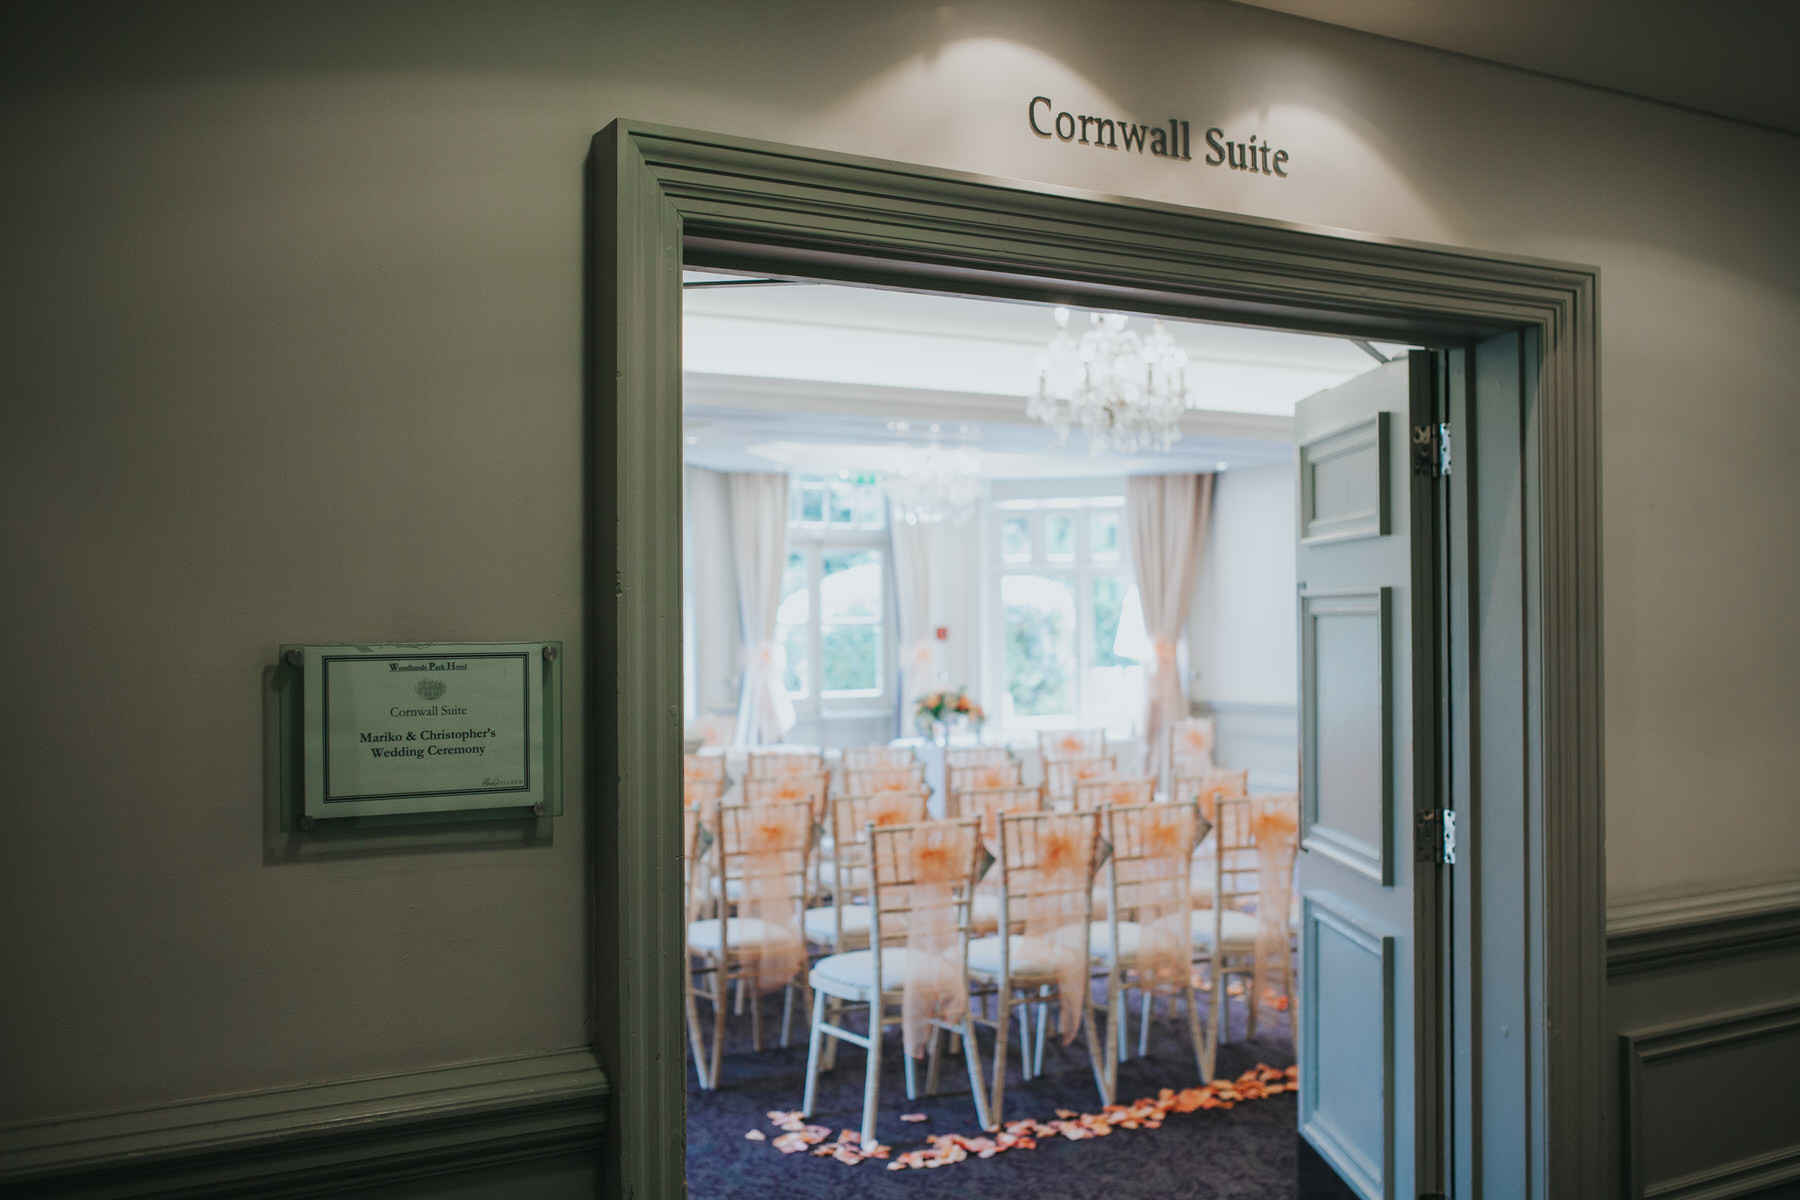 92 Woodlands Hotel wedding ceremony room Cornwall Suite.jpg